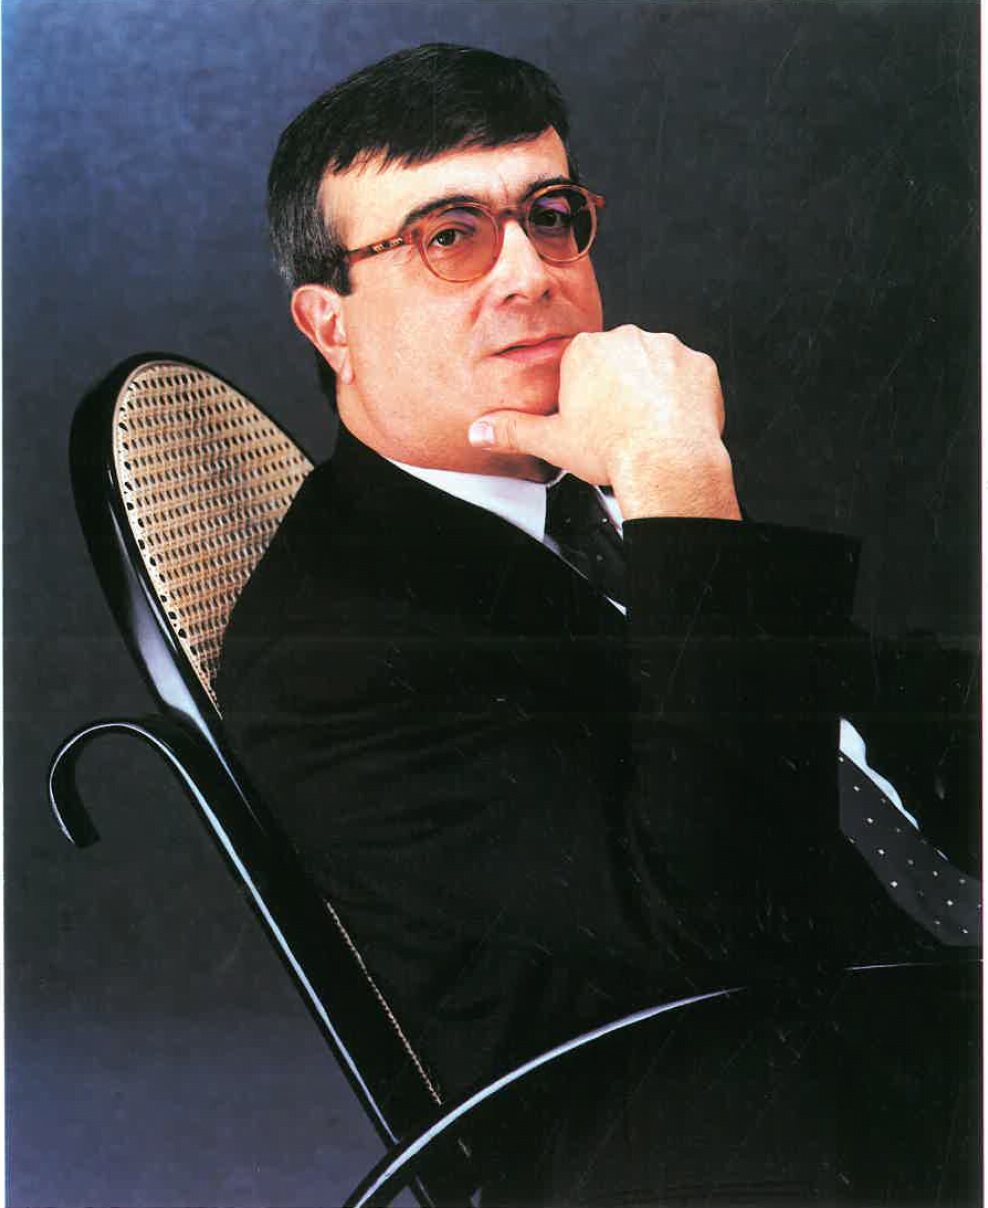 Antoni Sabaté Ibarzs